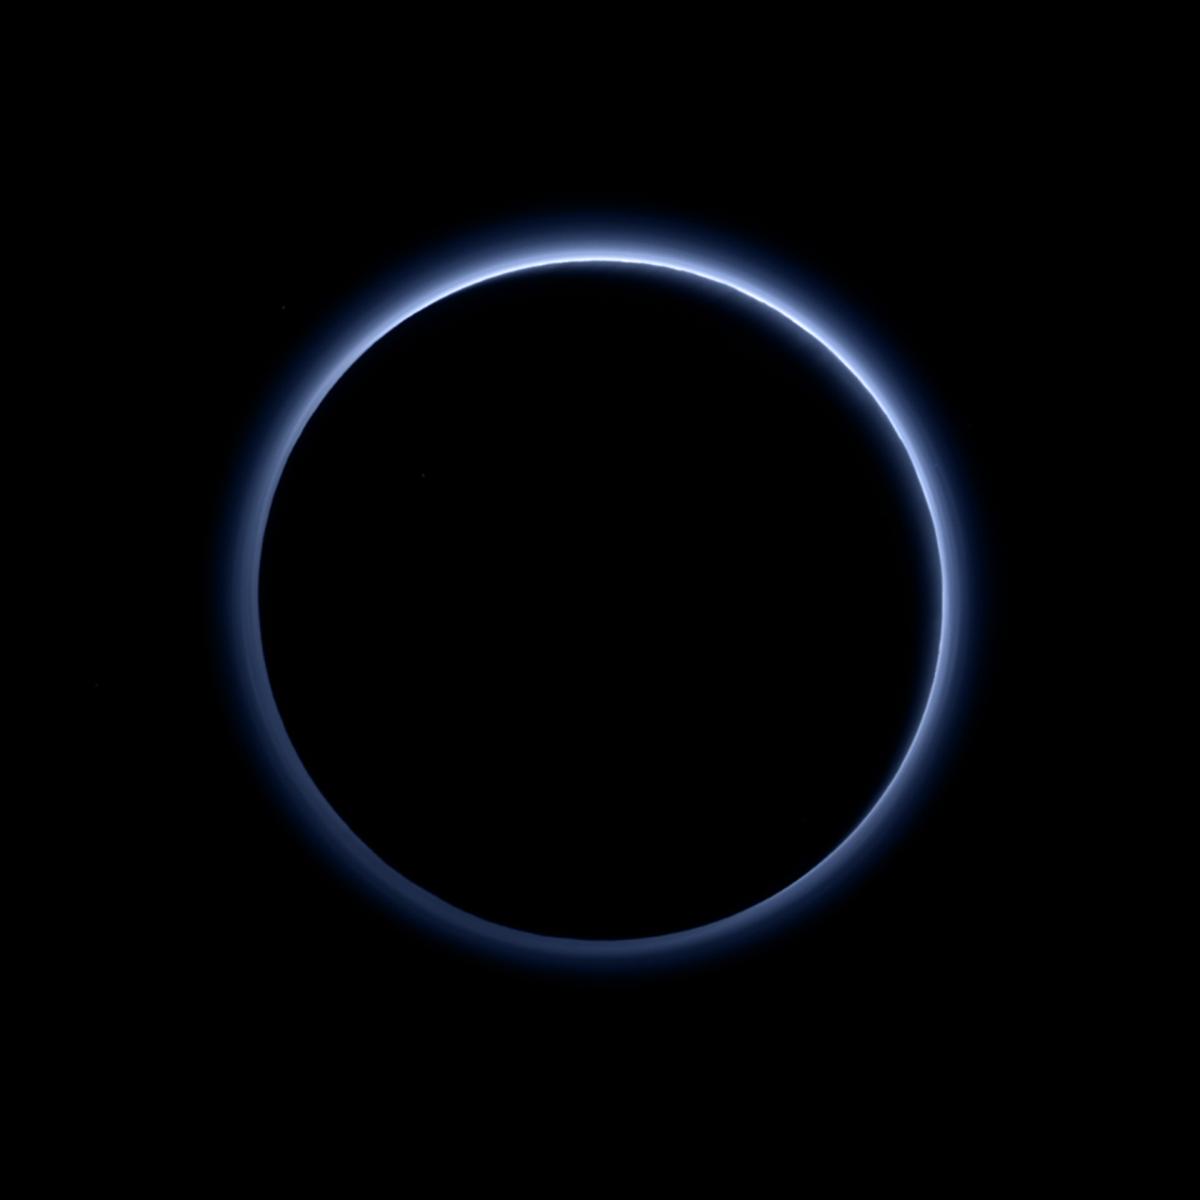 Bild zu New Horizons, Pluto